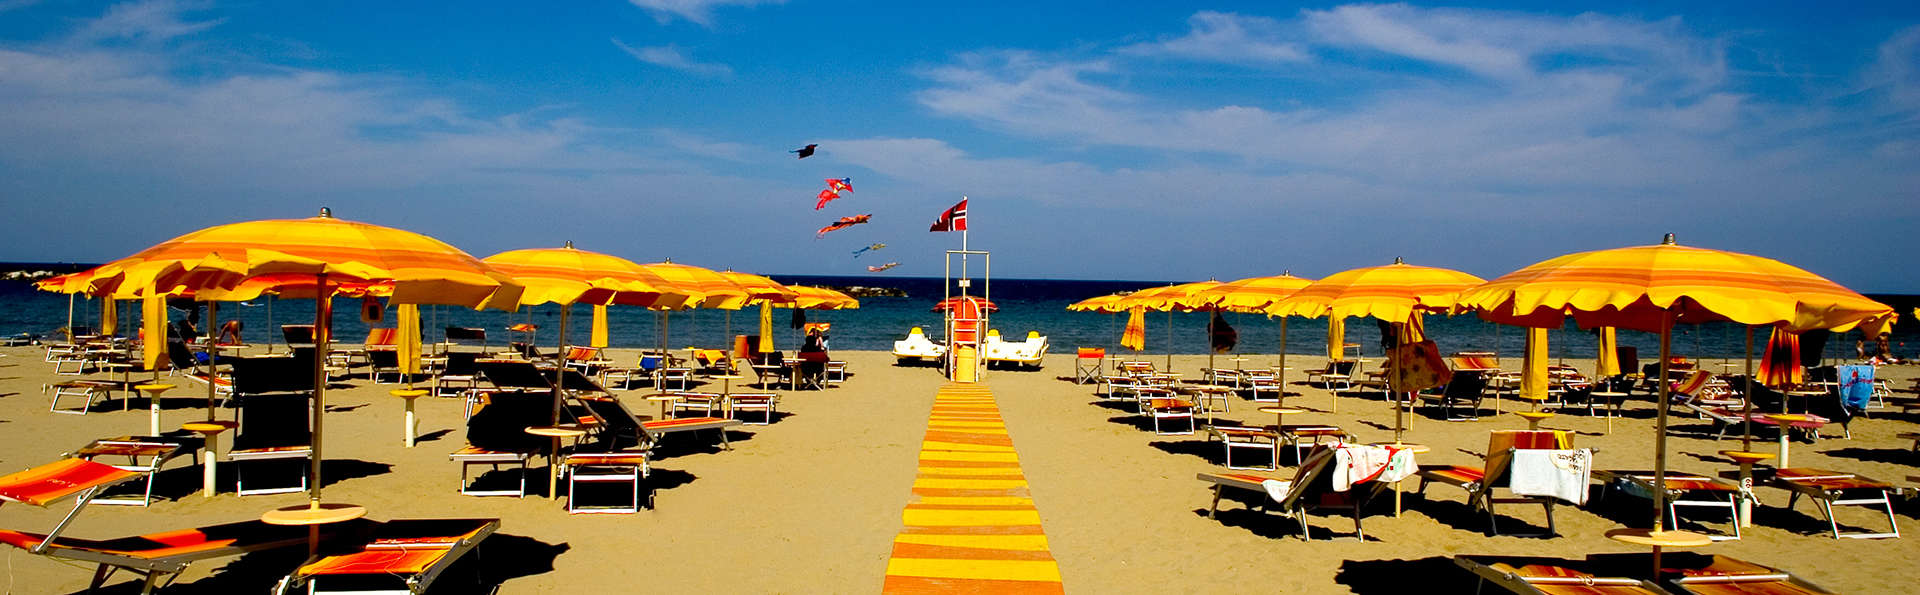 Hotel Giannella 3 Rimini Italie